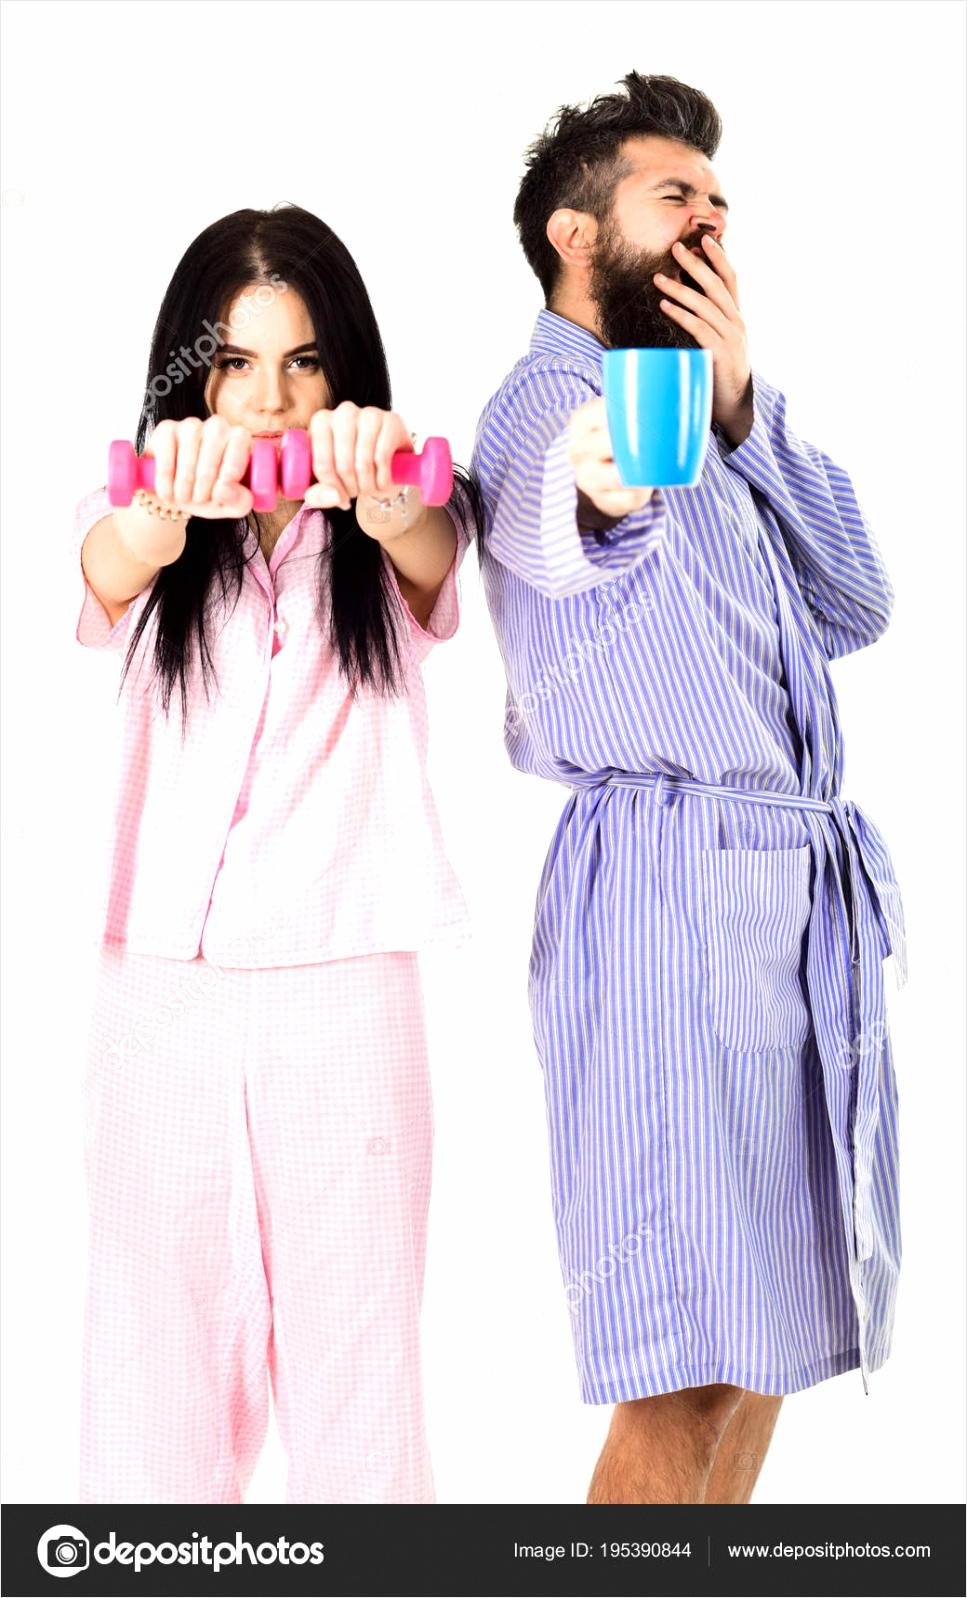 depositphotos stock photo couple family offers alternative energy ayopw